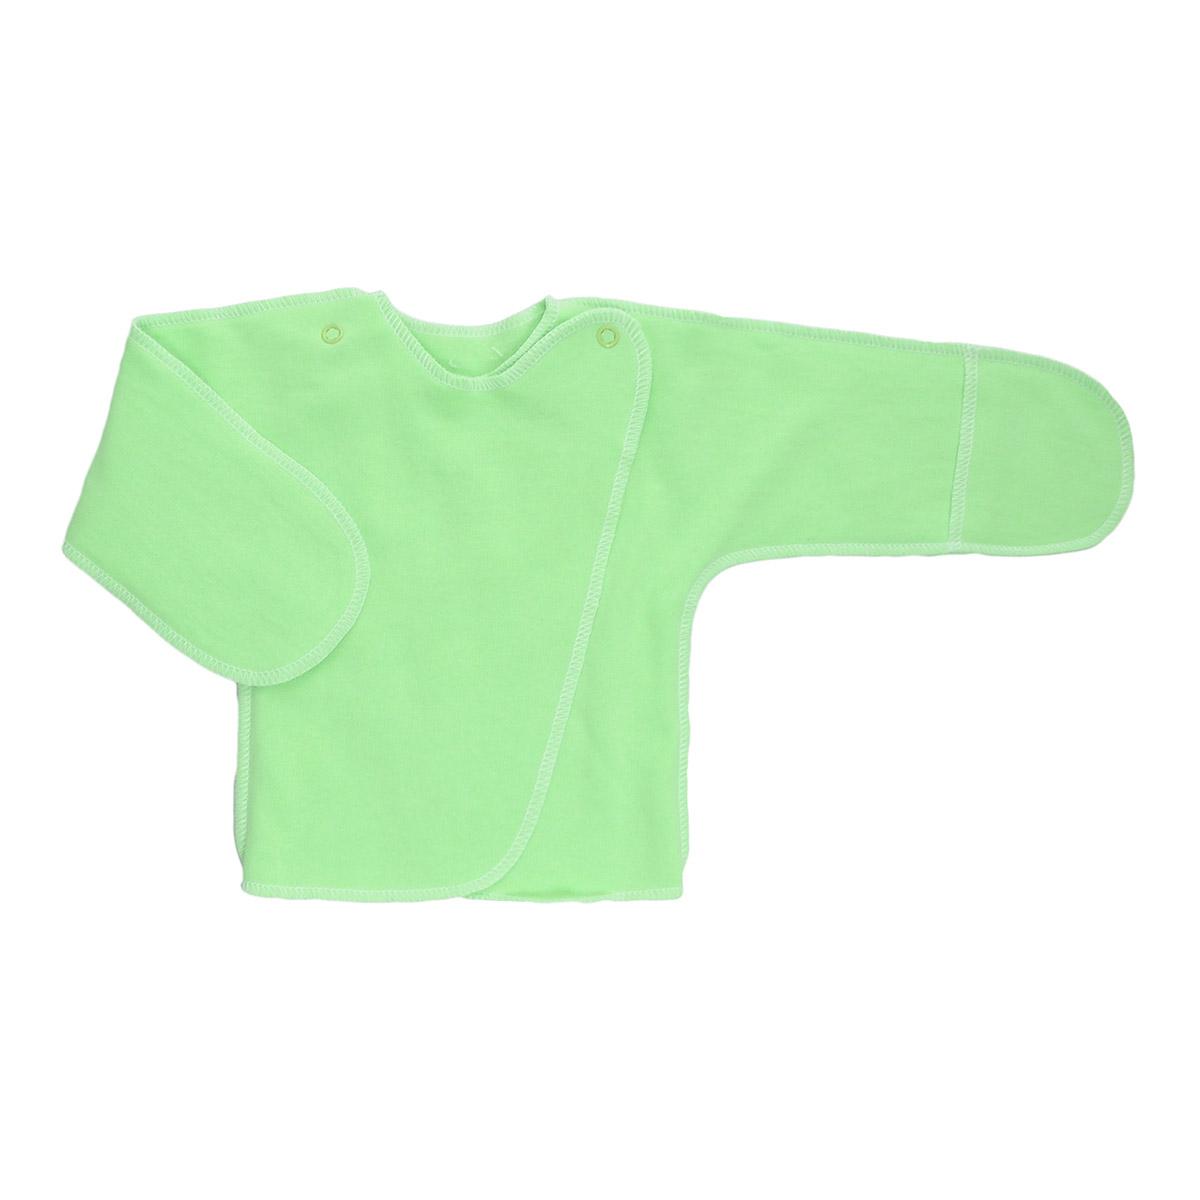 Распашонка Трон-Плюс, цвет: светло-зеленый. 5023 . Размер 68, 6 месяцев bq m 2400 taipei pink